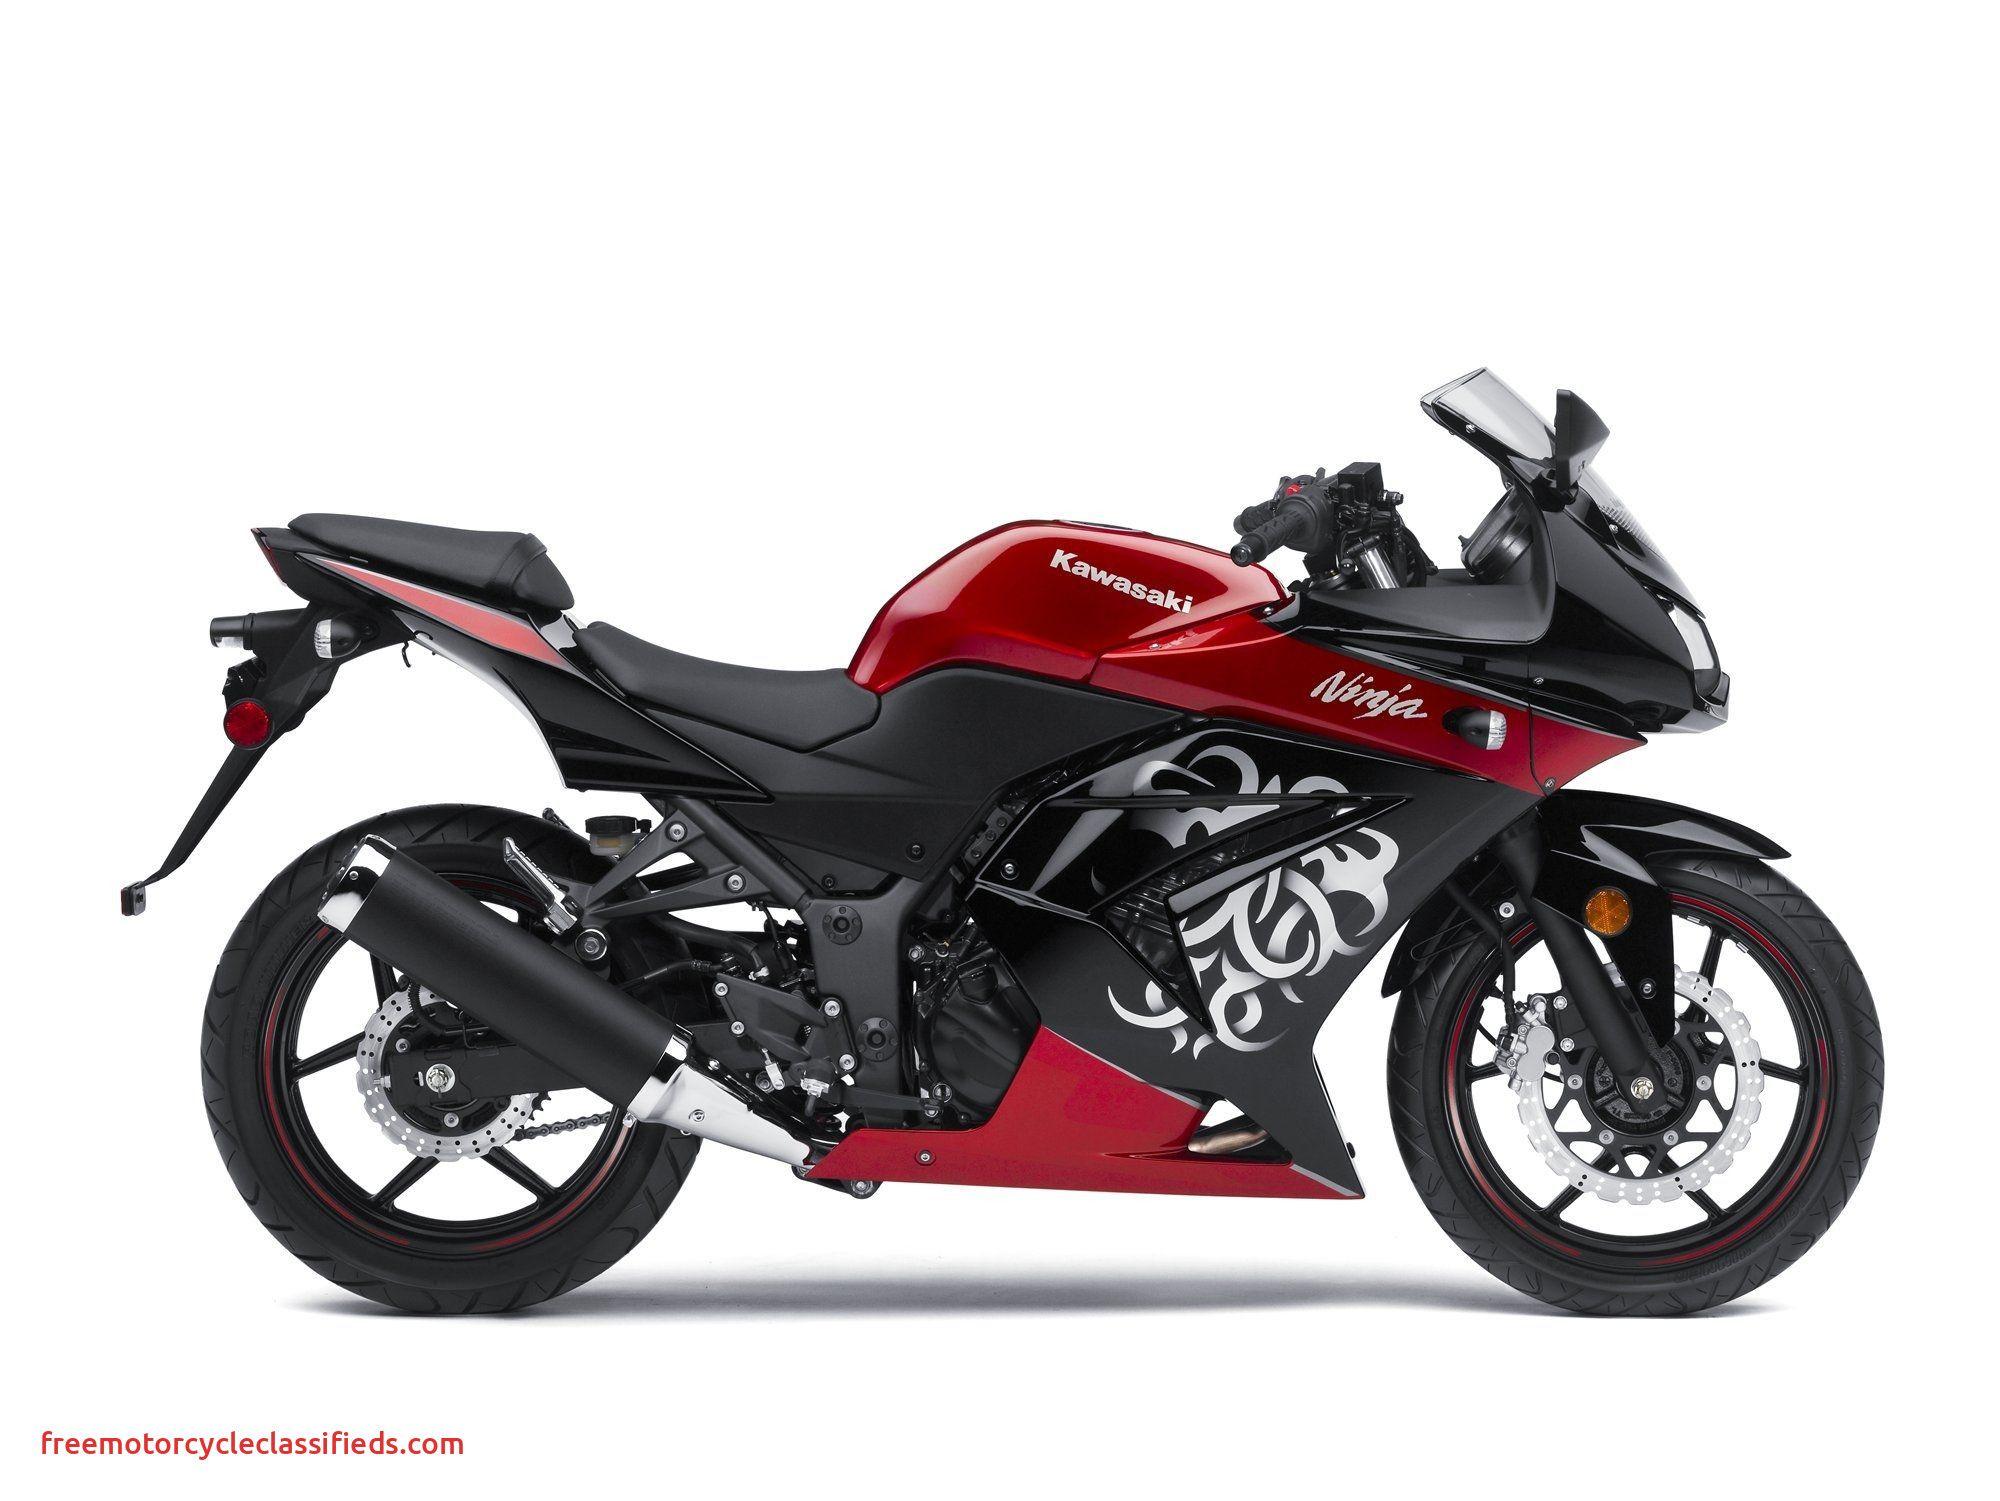 Lovely 2008 Kawasaki Ninja 250r in 2020 Ninja motorcycle